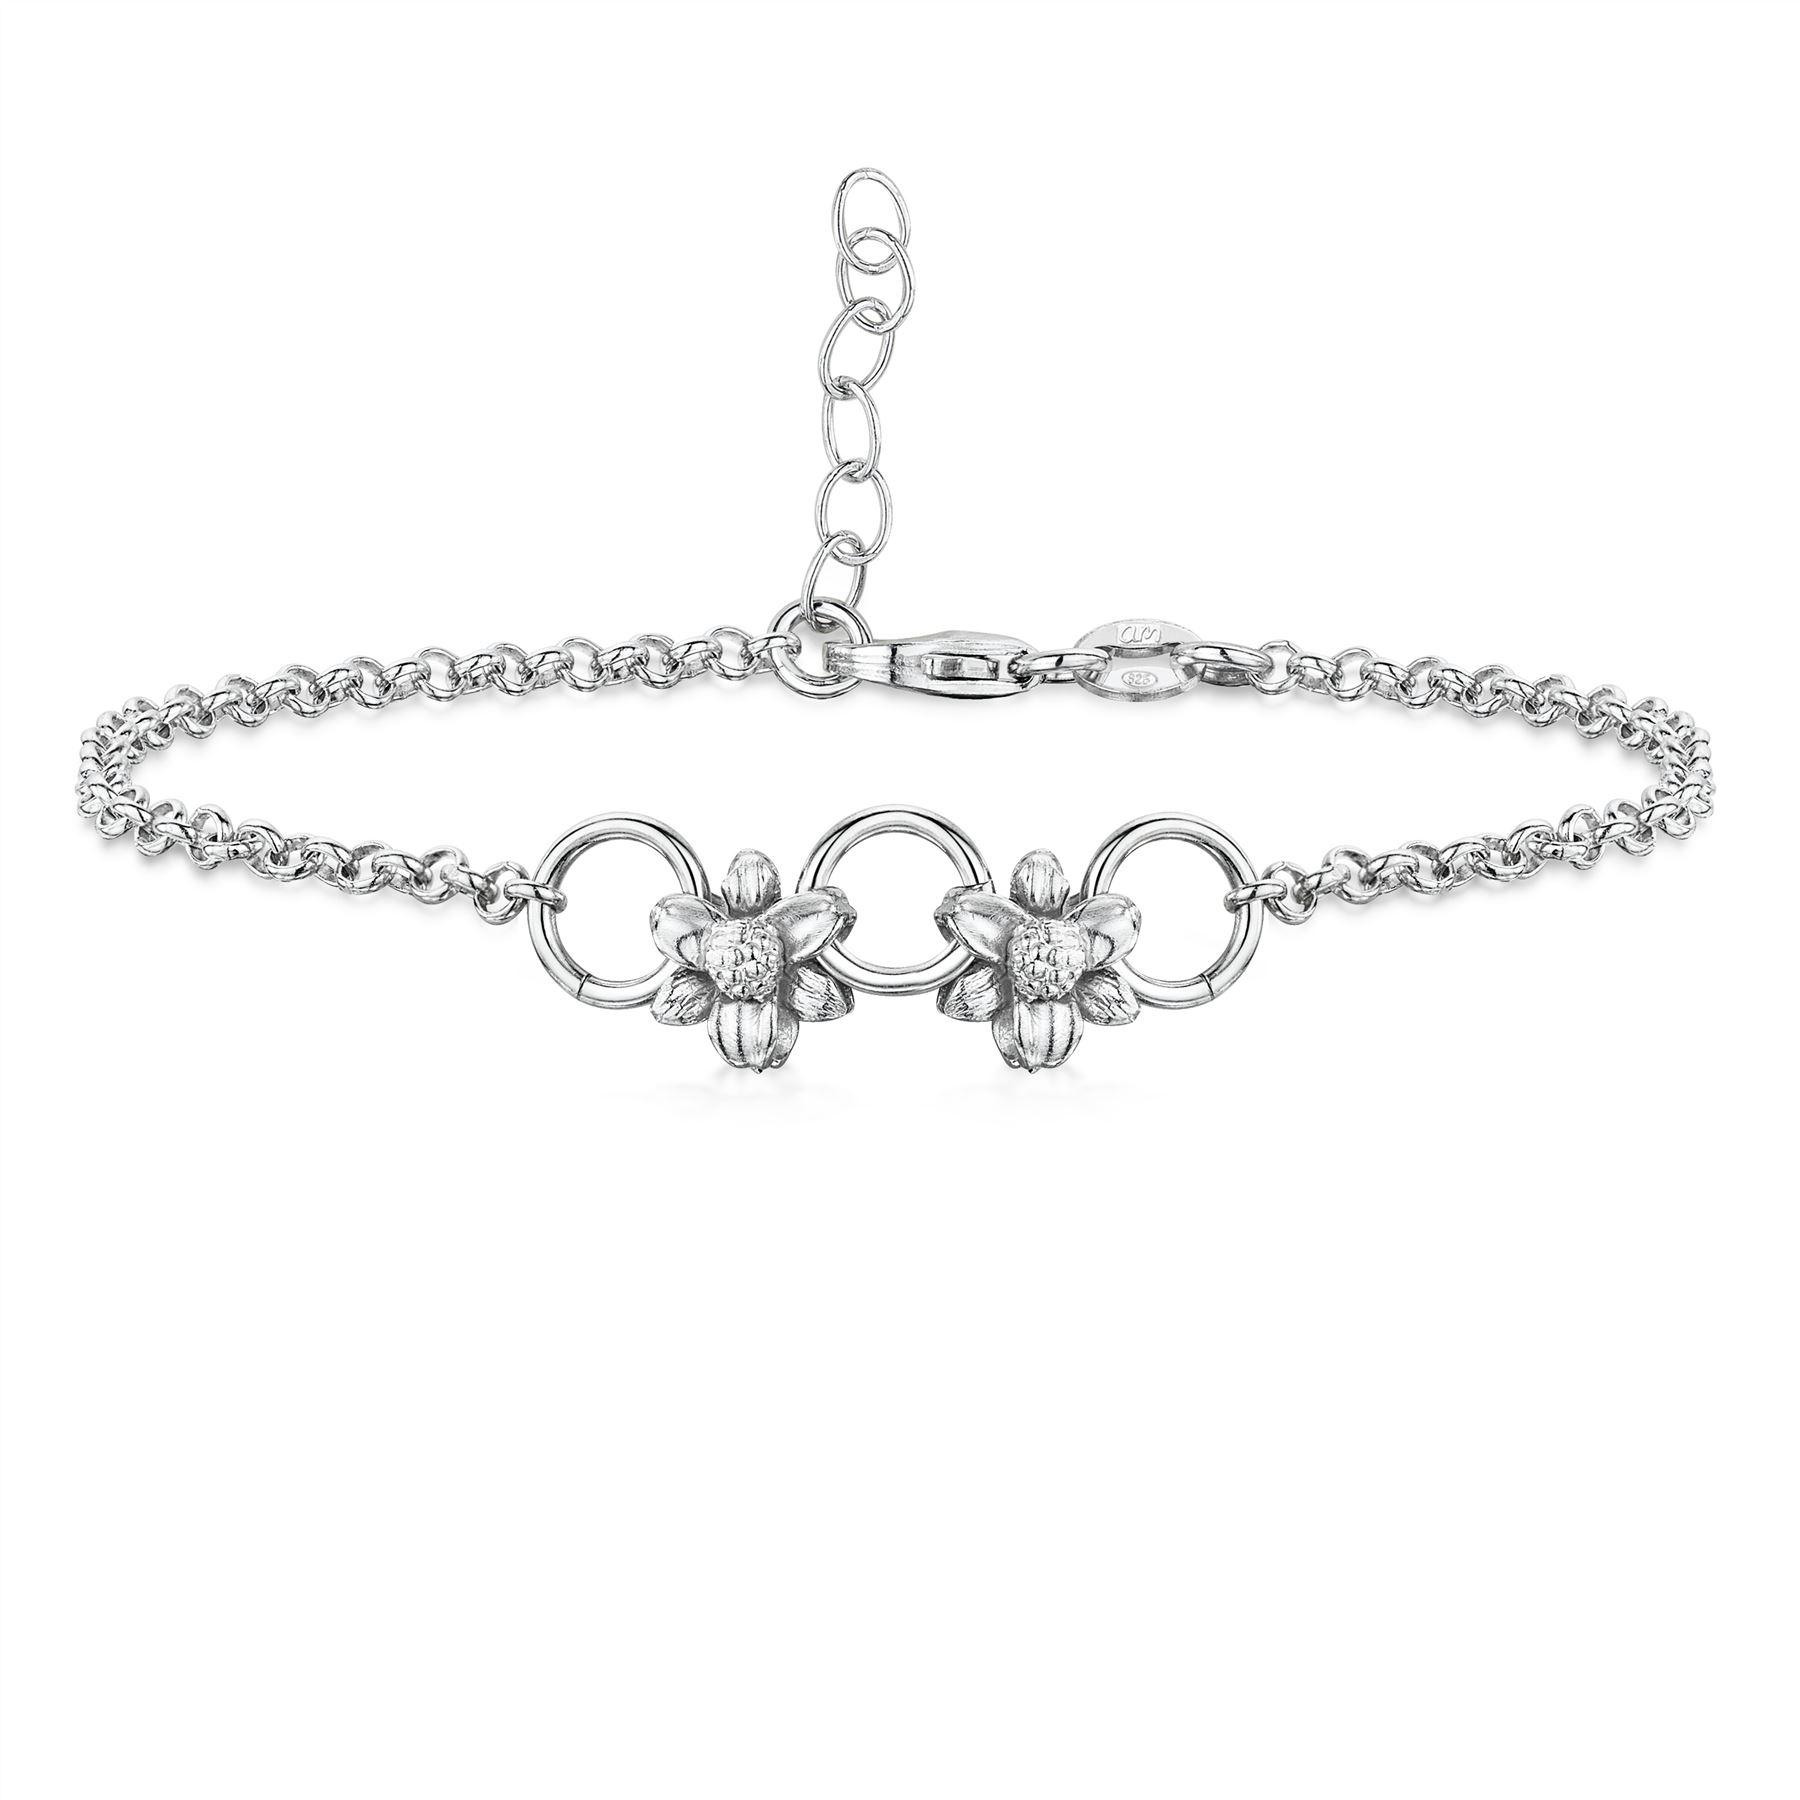 Amberta-Jewelry-925-Sterling-Silver-Adjustable-Bracelet-Italian-Bangle-for-Women miniature 78